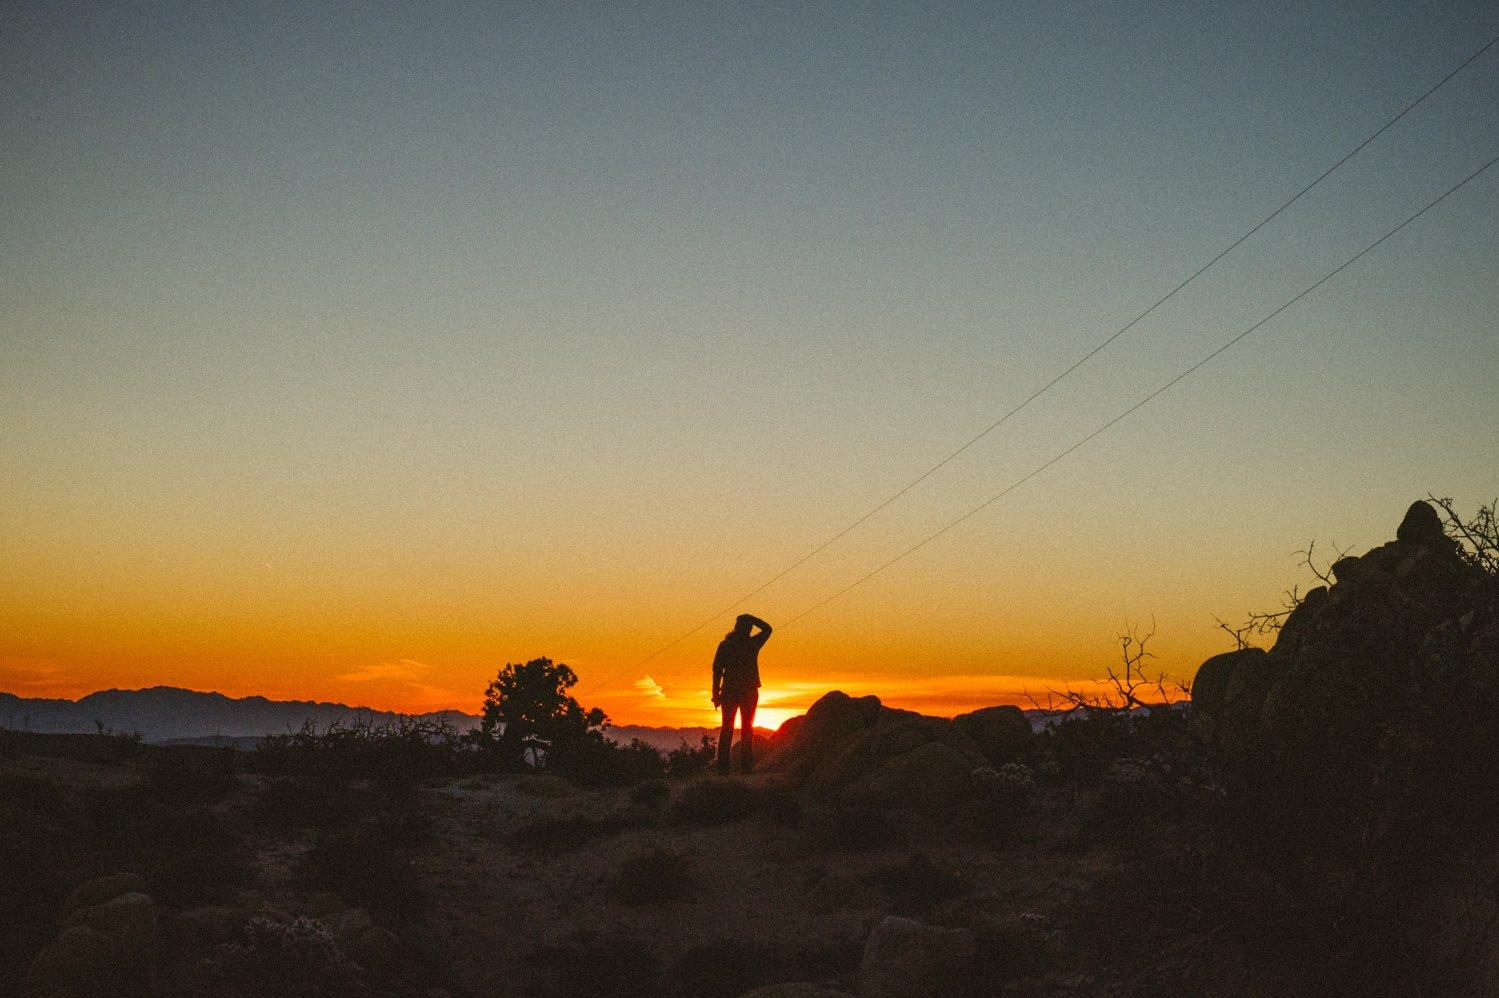 USA ROADTRIP TRAVEL PHOTOGRAPHY-234